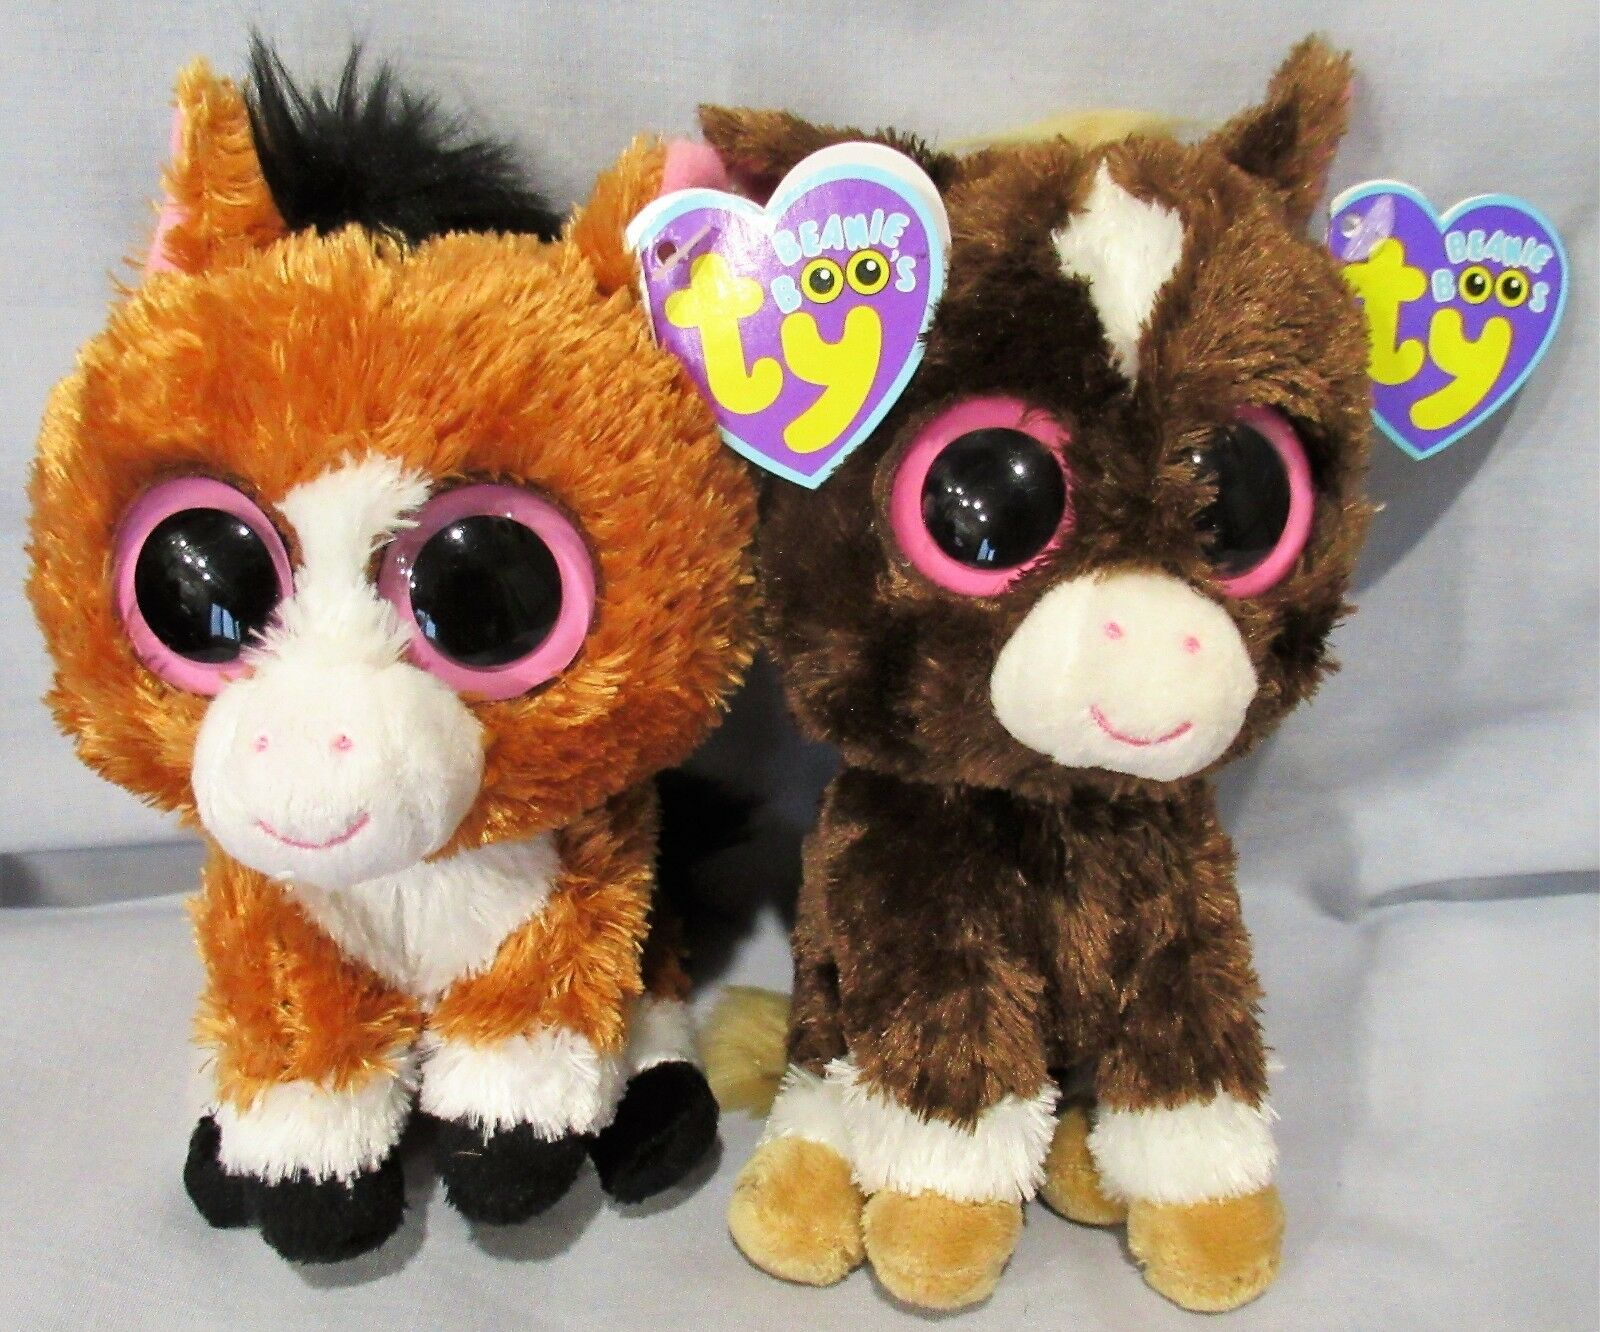 DAKOTA the 6  Horse (dark & light version) - 2 TY Beanie Boo's - NEW w MINT TAGS